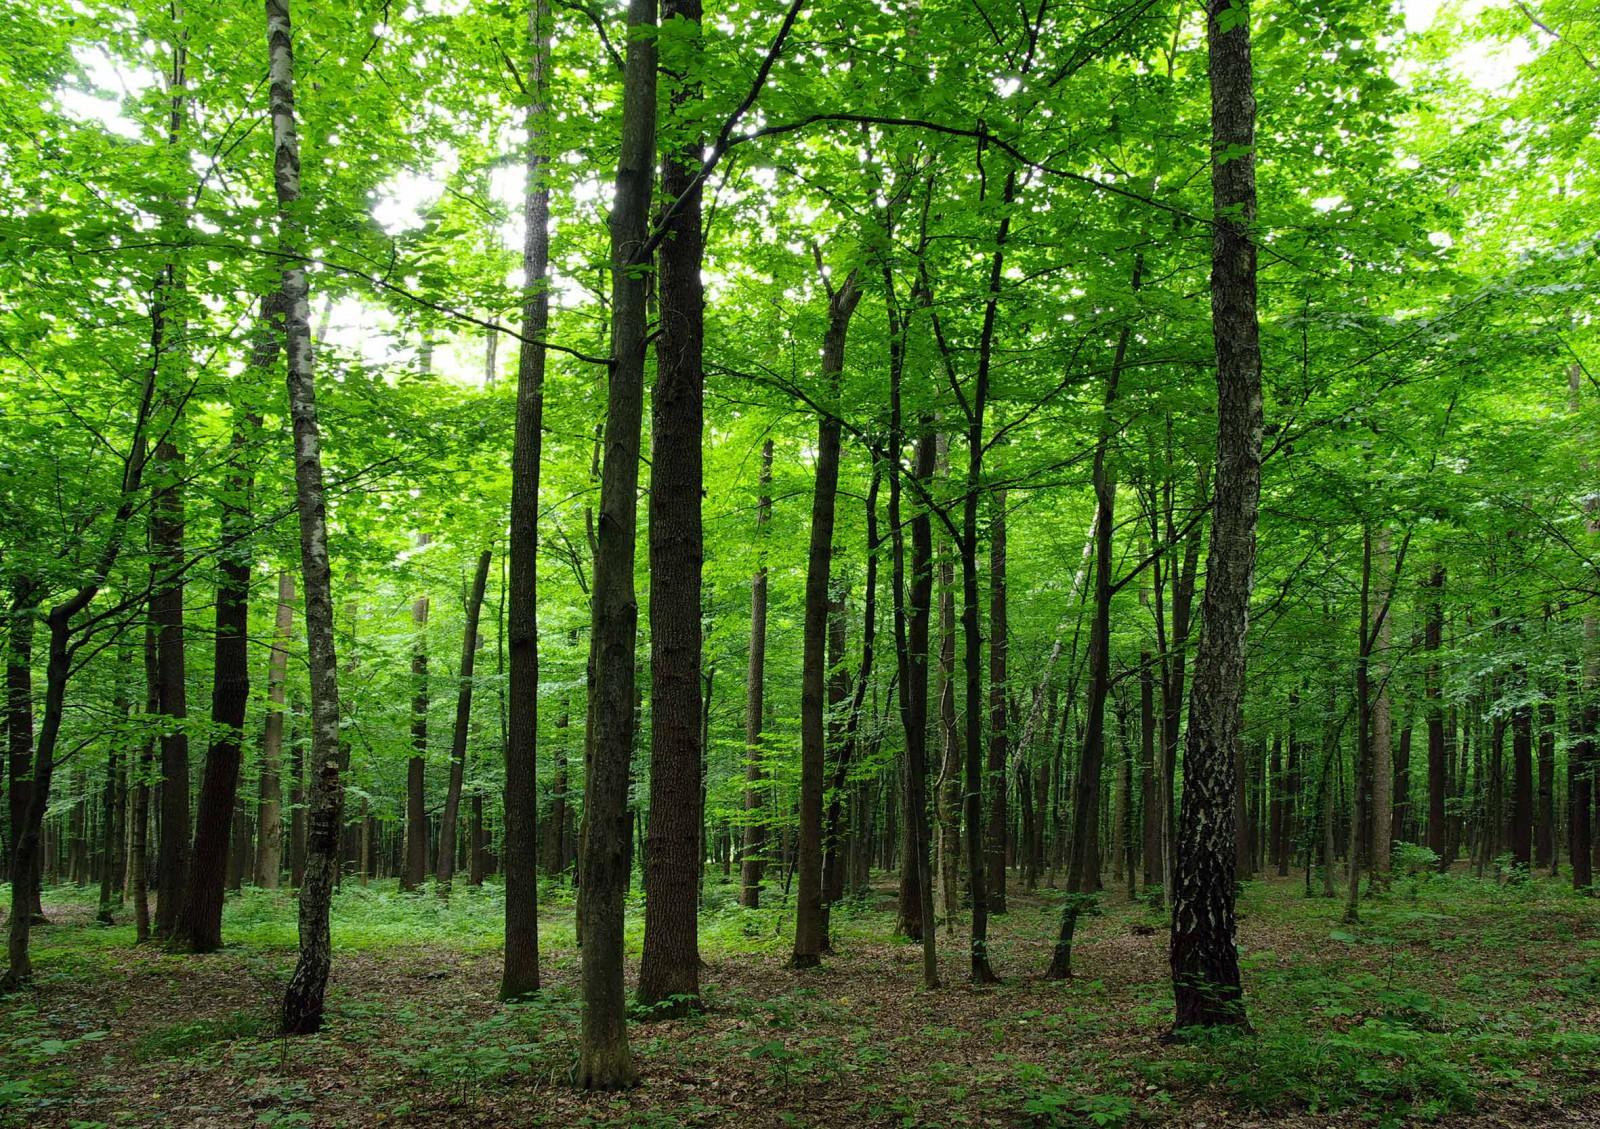 Fototapete Tapete Wald Baume Natur 360x254cm